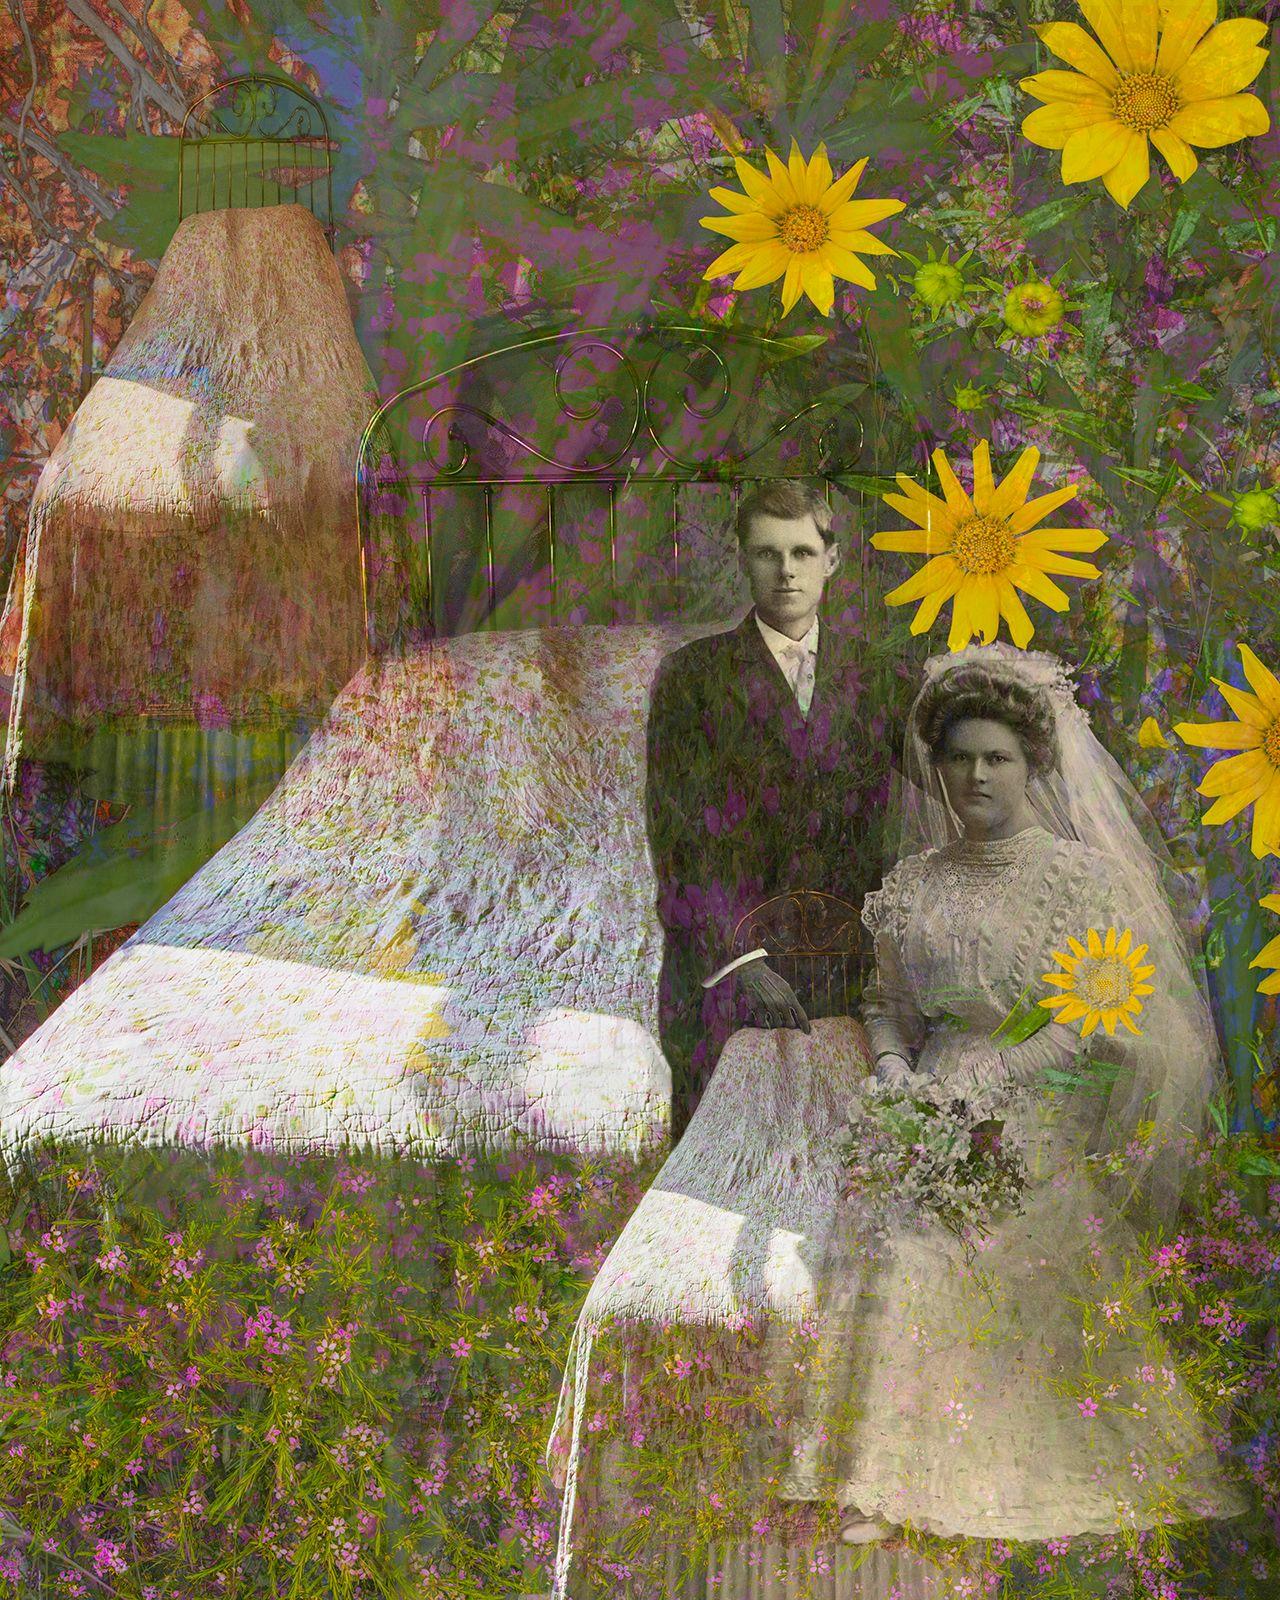 Bridal Bed 2